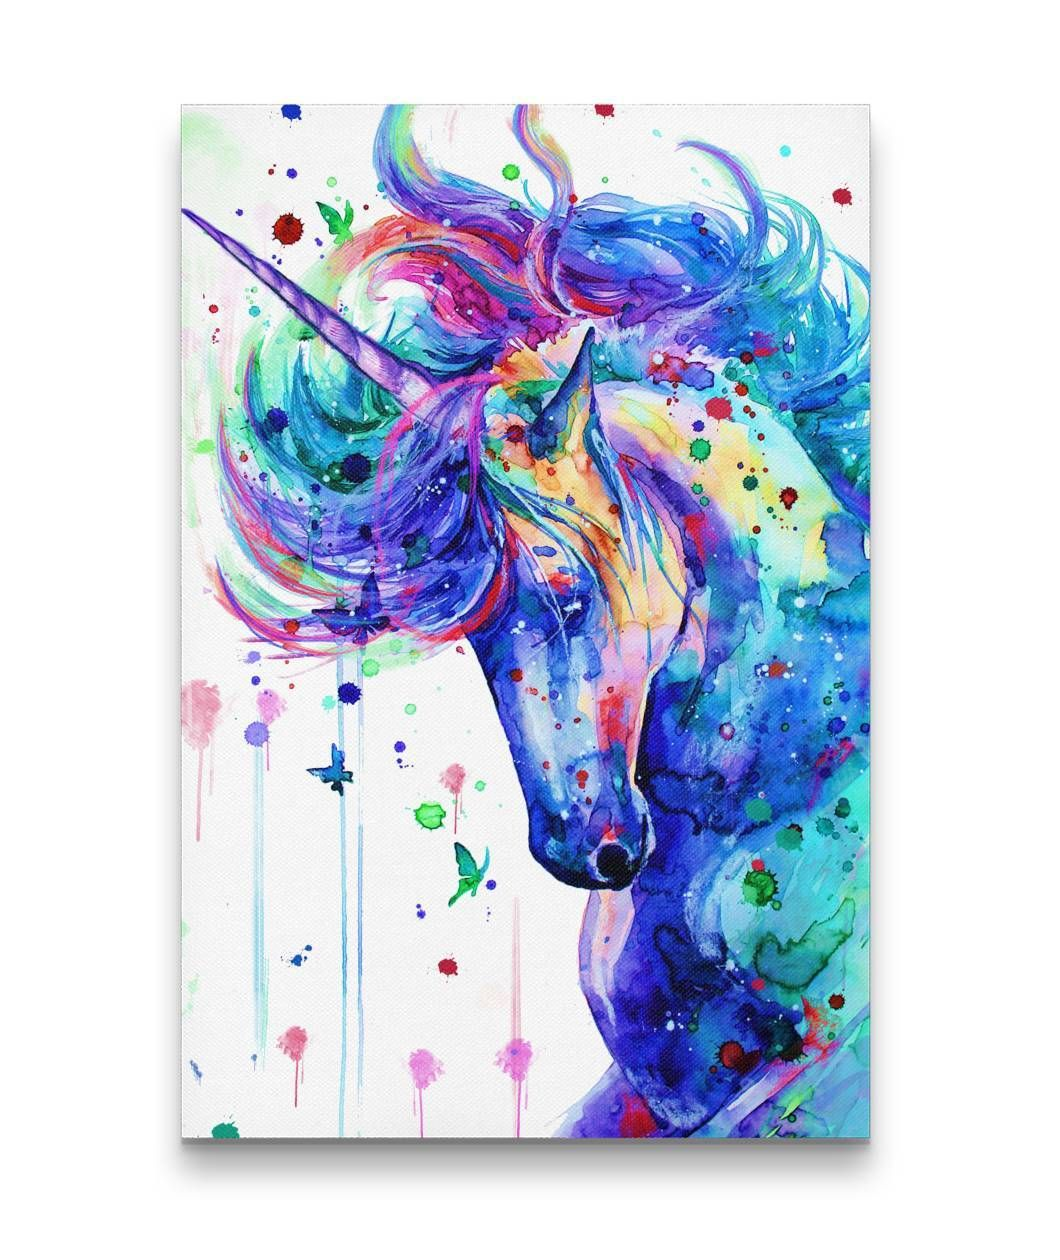 d6455cc4ea1ba 3D Printed Cartoon Colorful Unicorn Canvas Prints | Unicorn Colorful ...